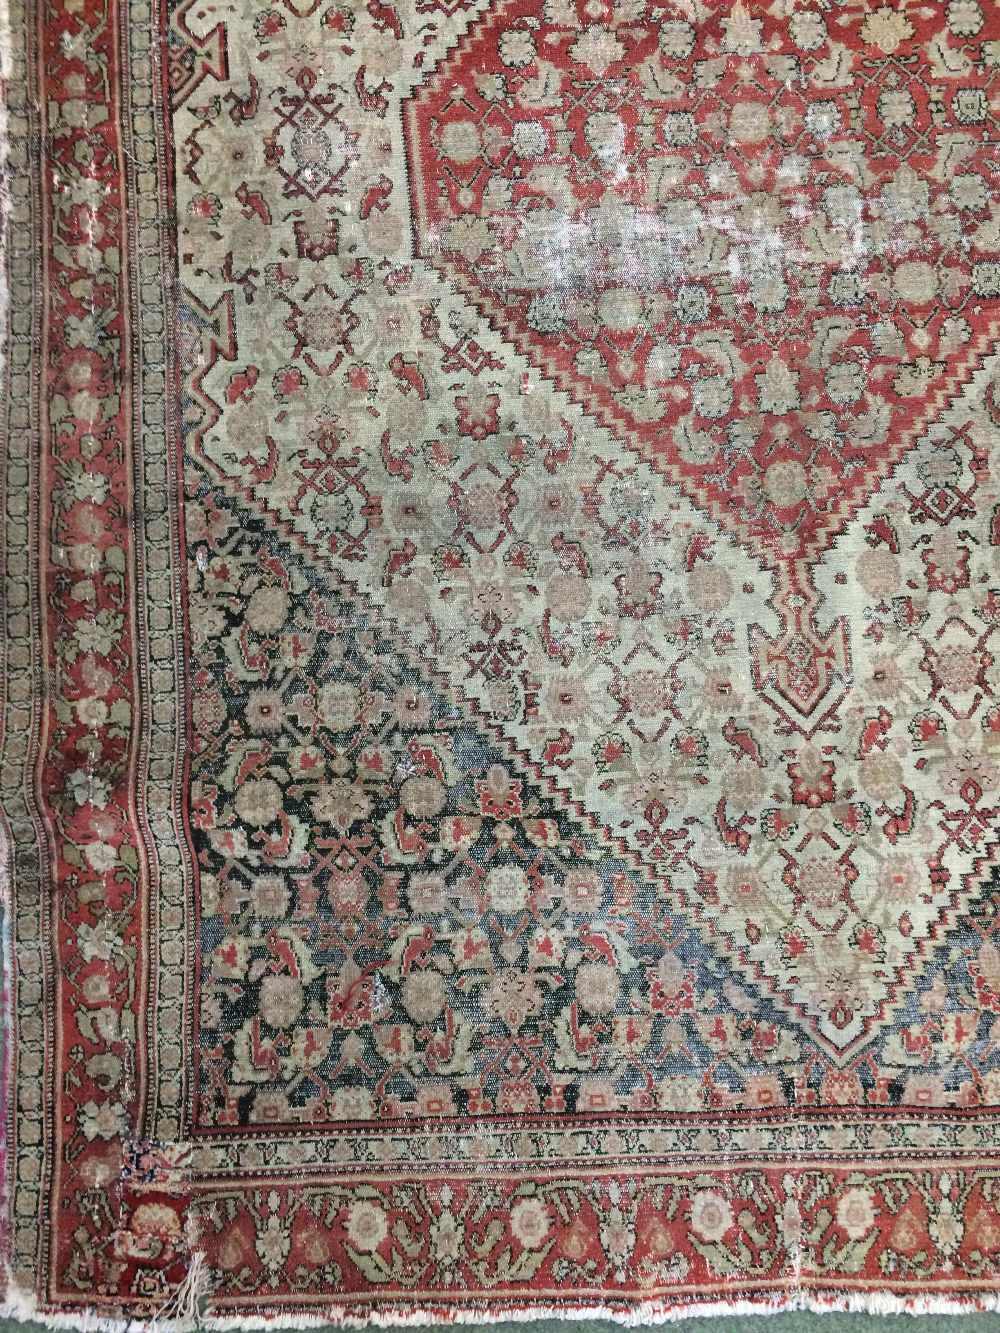 Lot 703 - Antique Senneh Persian rug circa C19th 1.86 X 1.3m